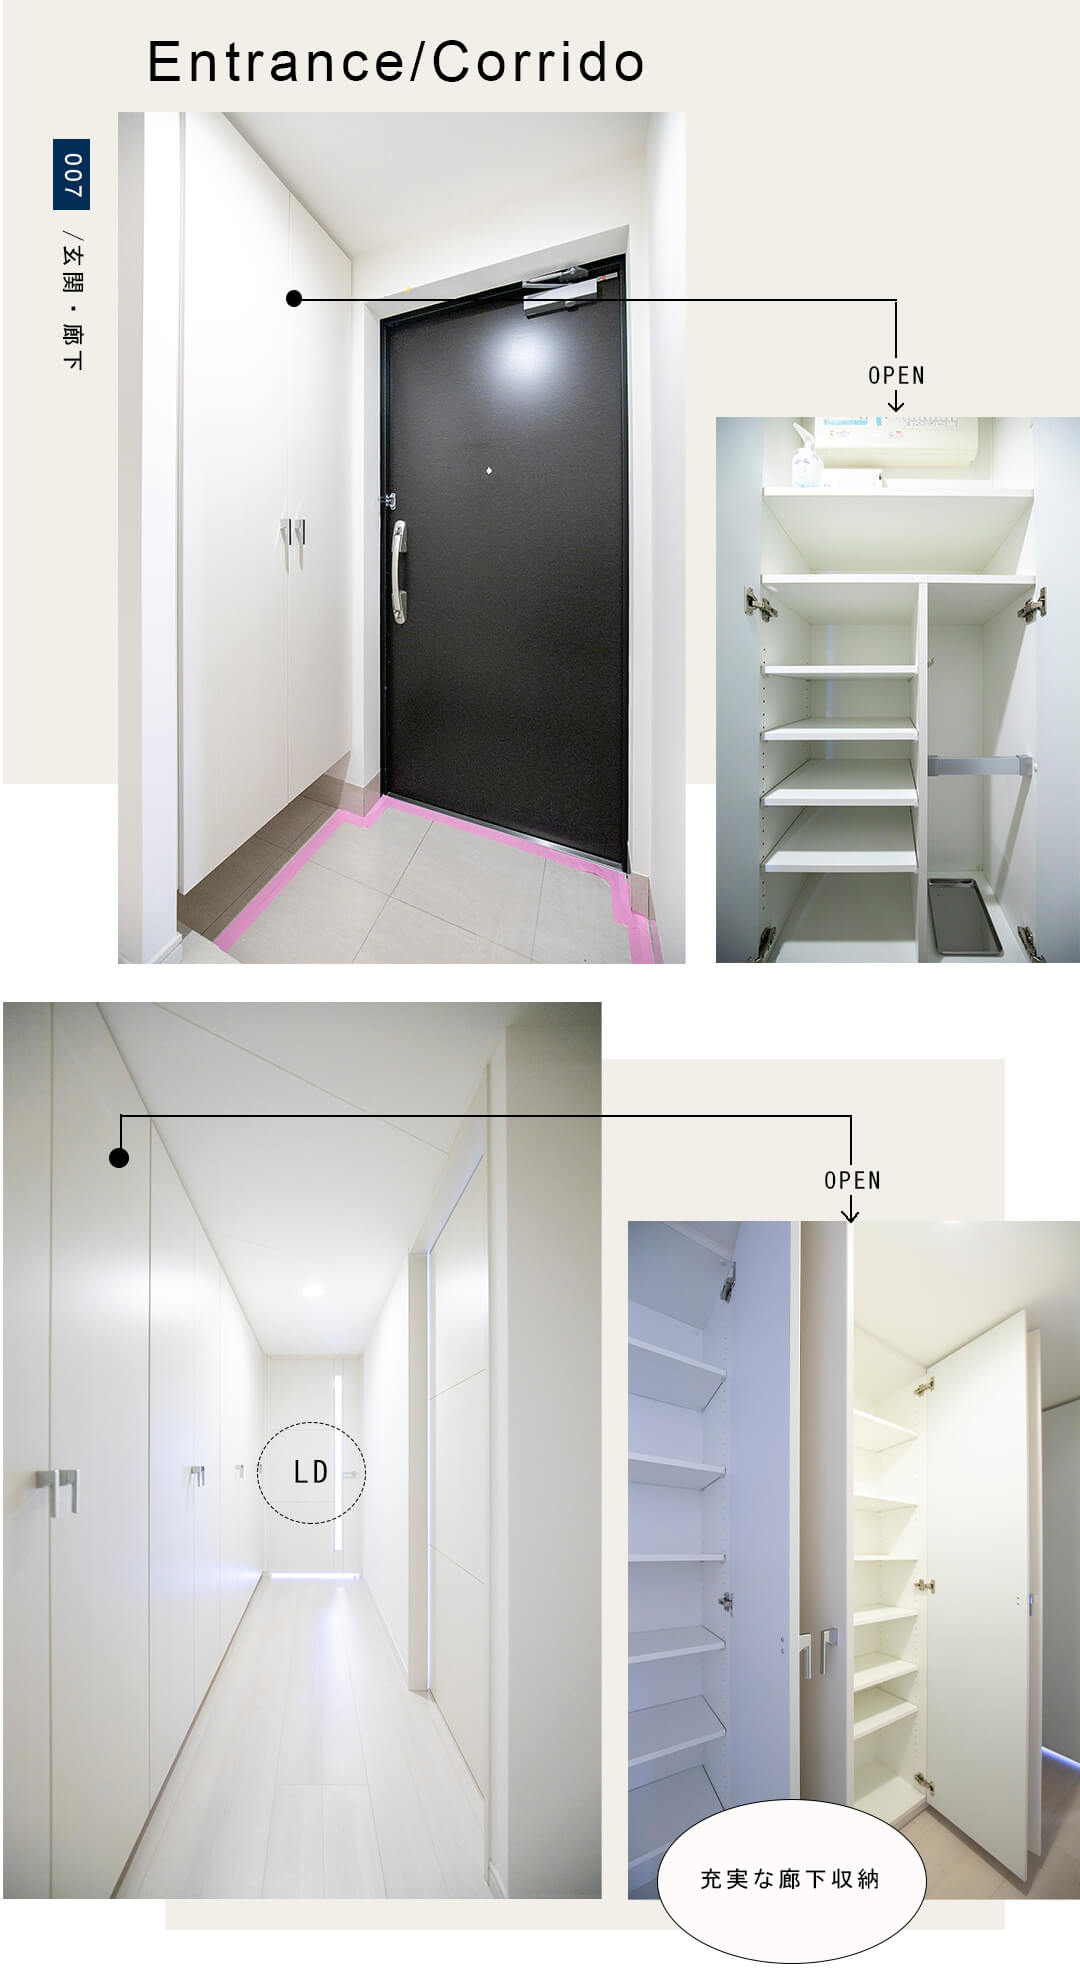 007玄関,廊下,Entrance,Corridor